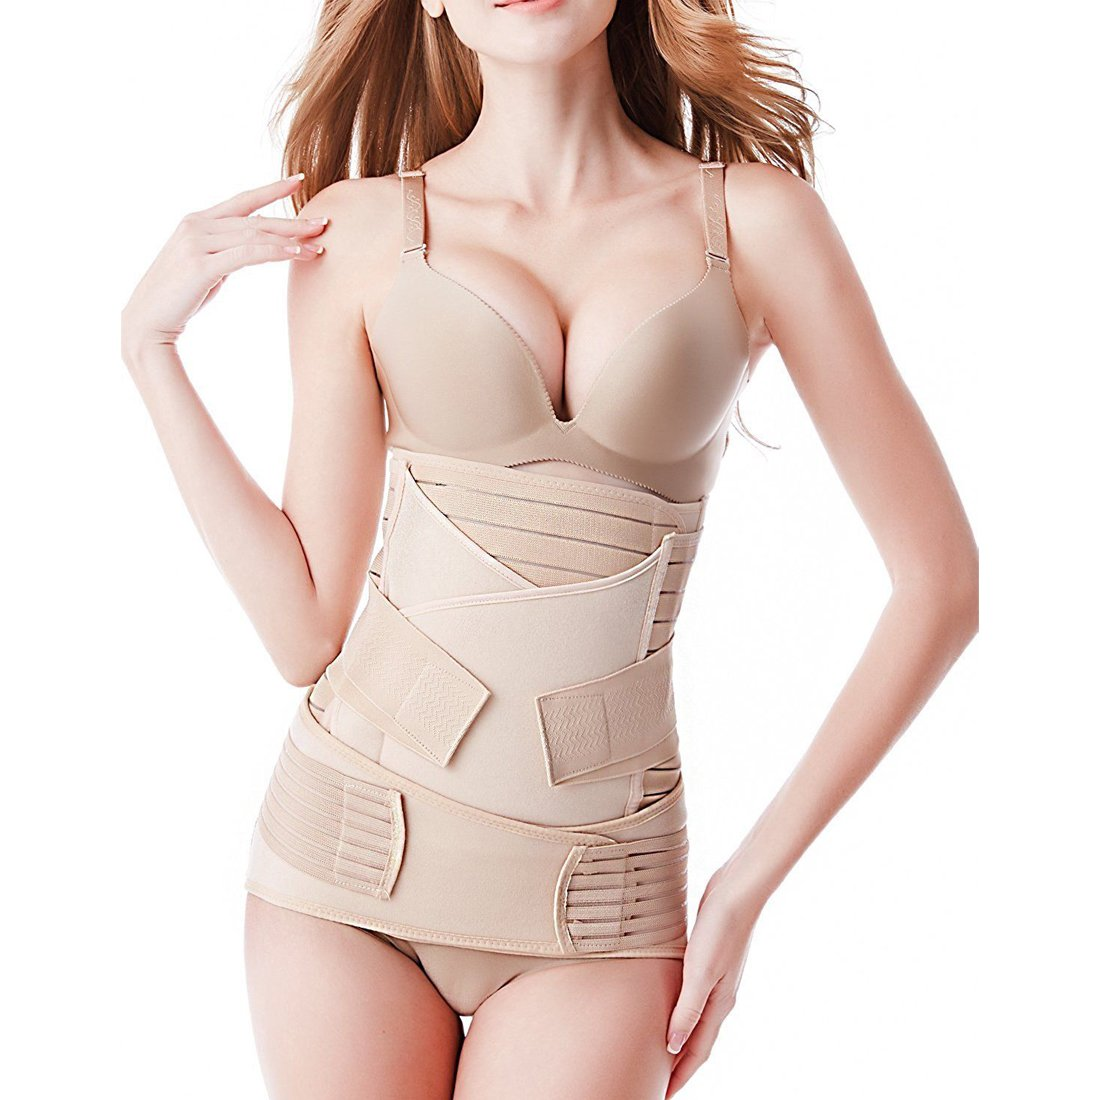 ASBYFR 3 in 1 Postpartum Belt Girdle Post Belly Belt After Birth Belly Band Postpartum Support C-section Recovery Belt for Women All Size Waist Pelvis Postnatal Belt Body Shaper